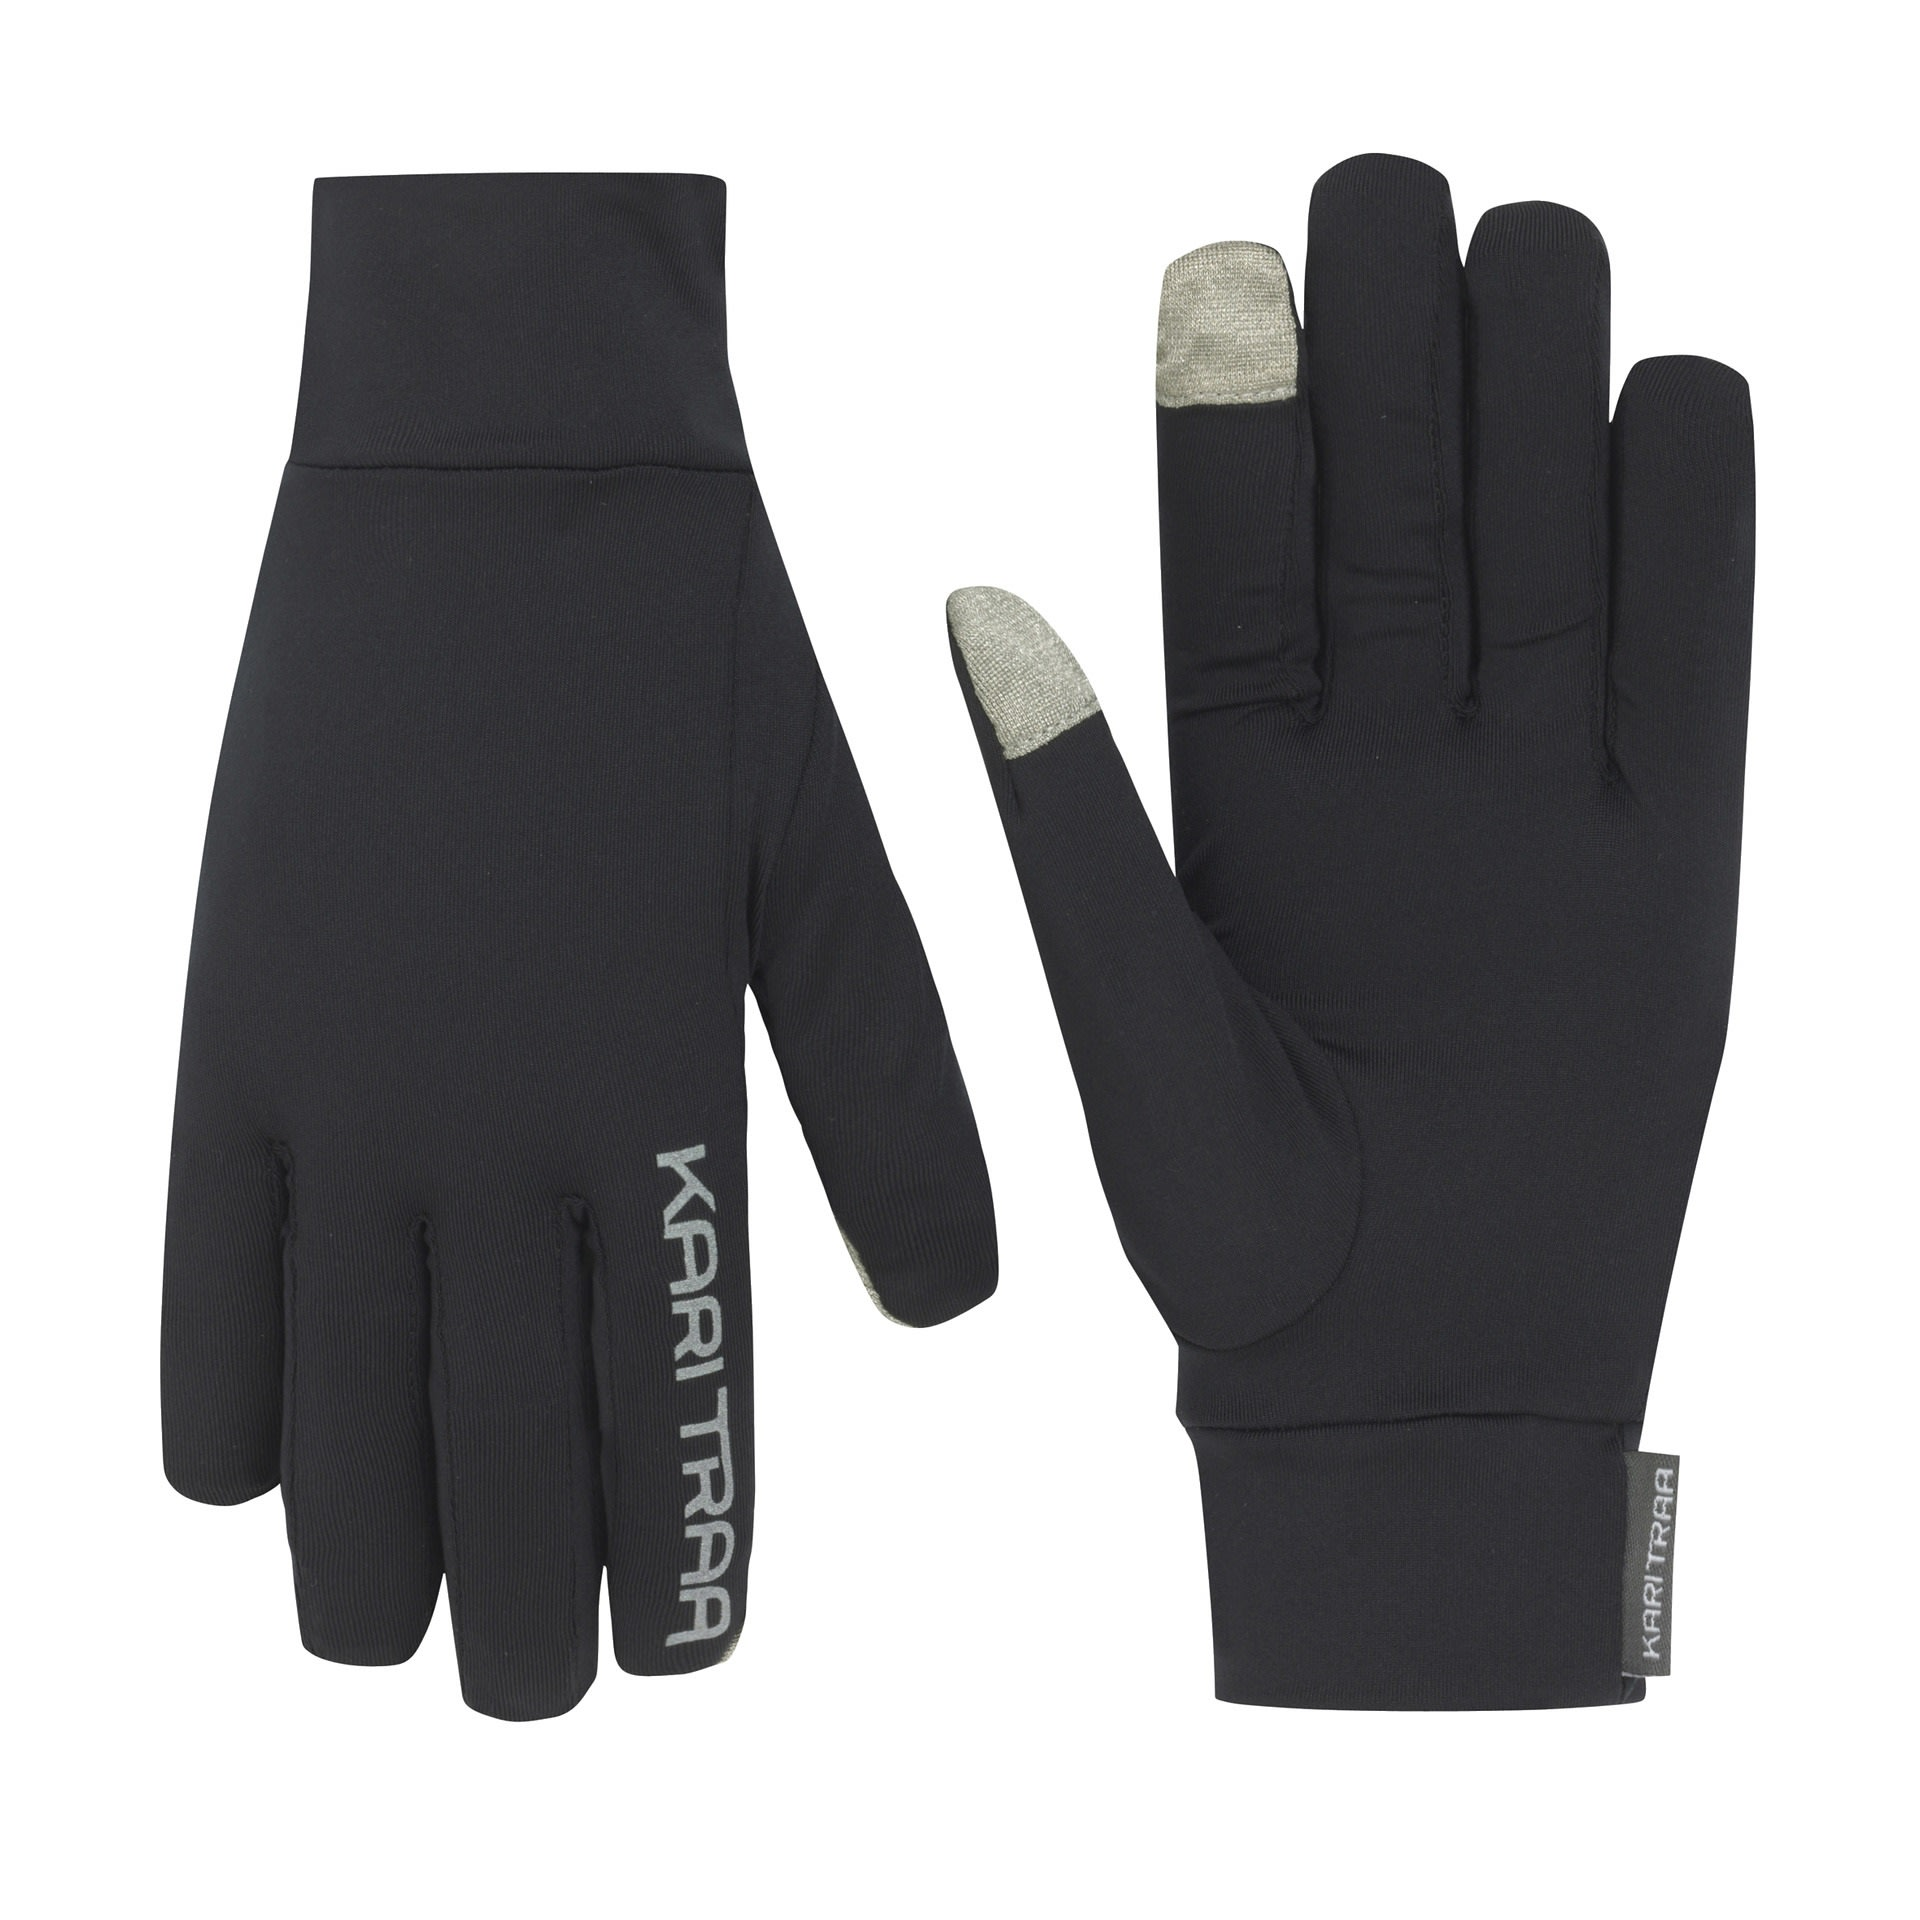 Myrblå Glove, Kari Traa